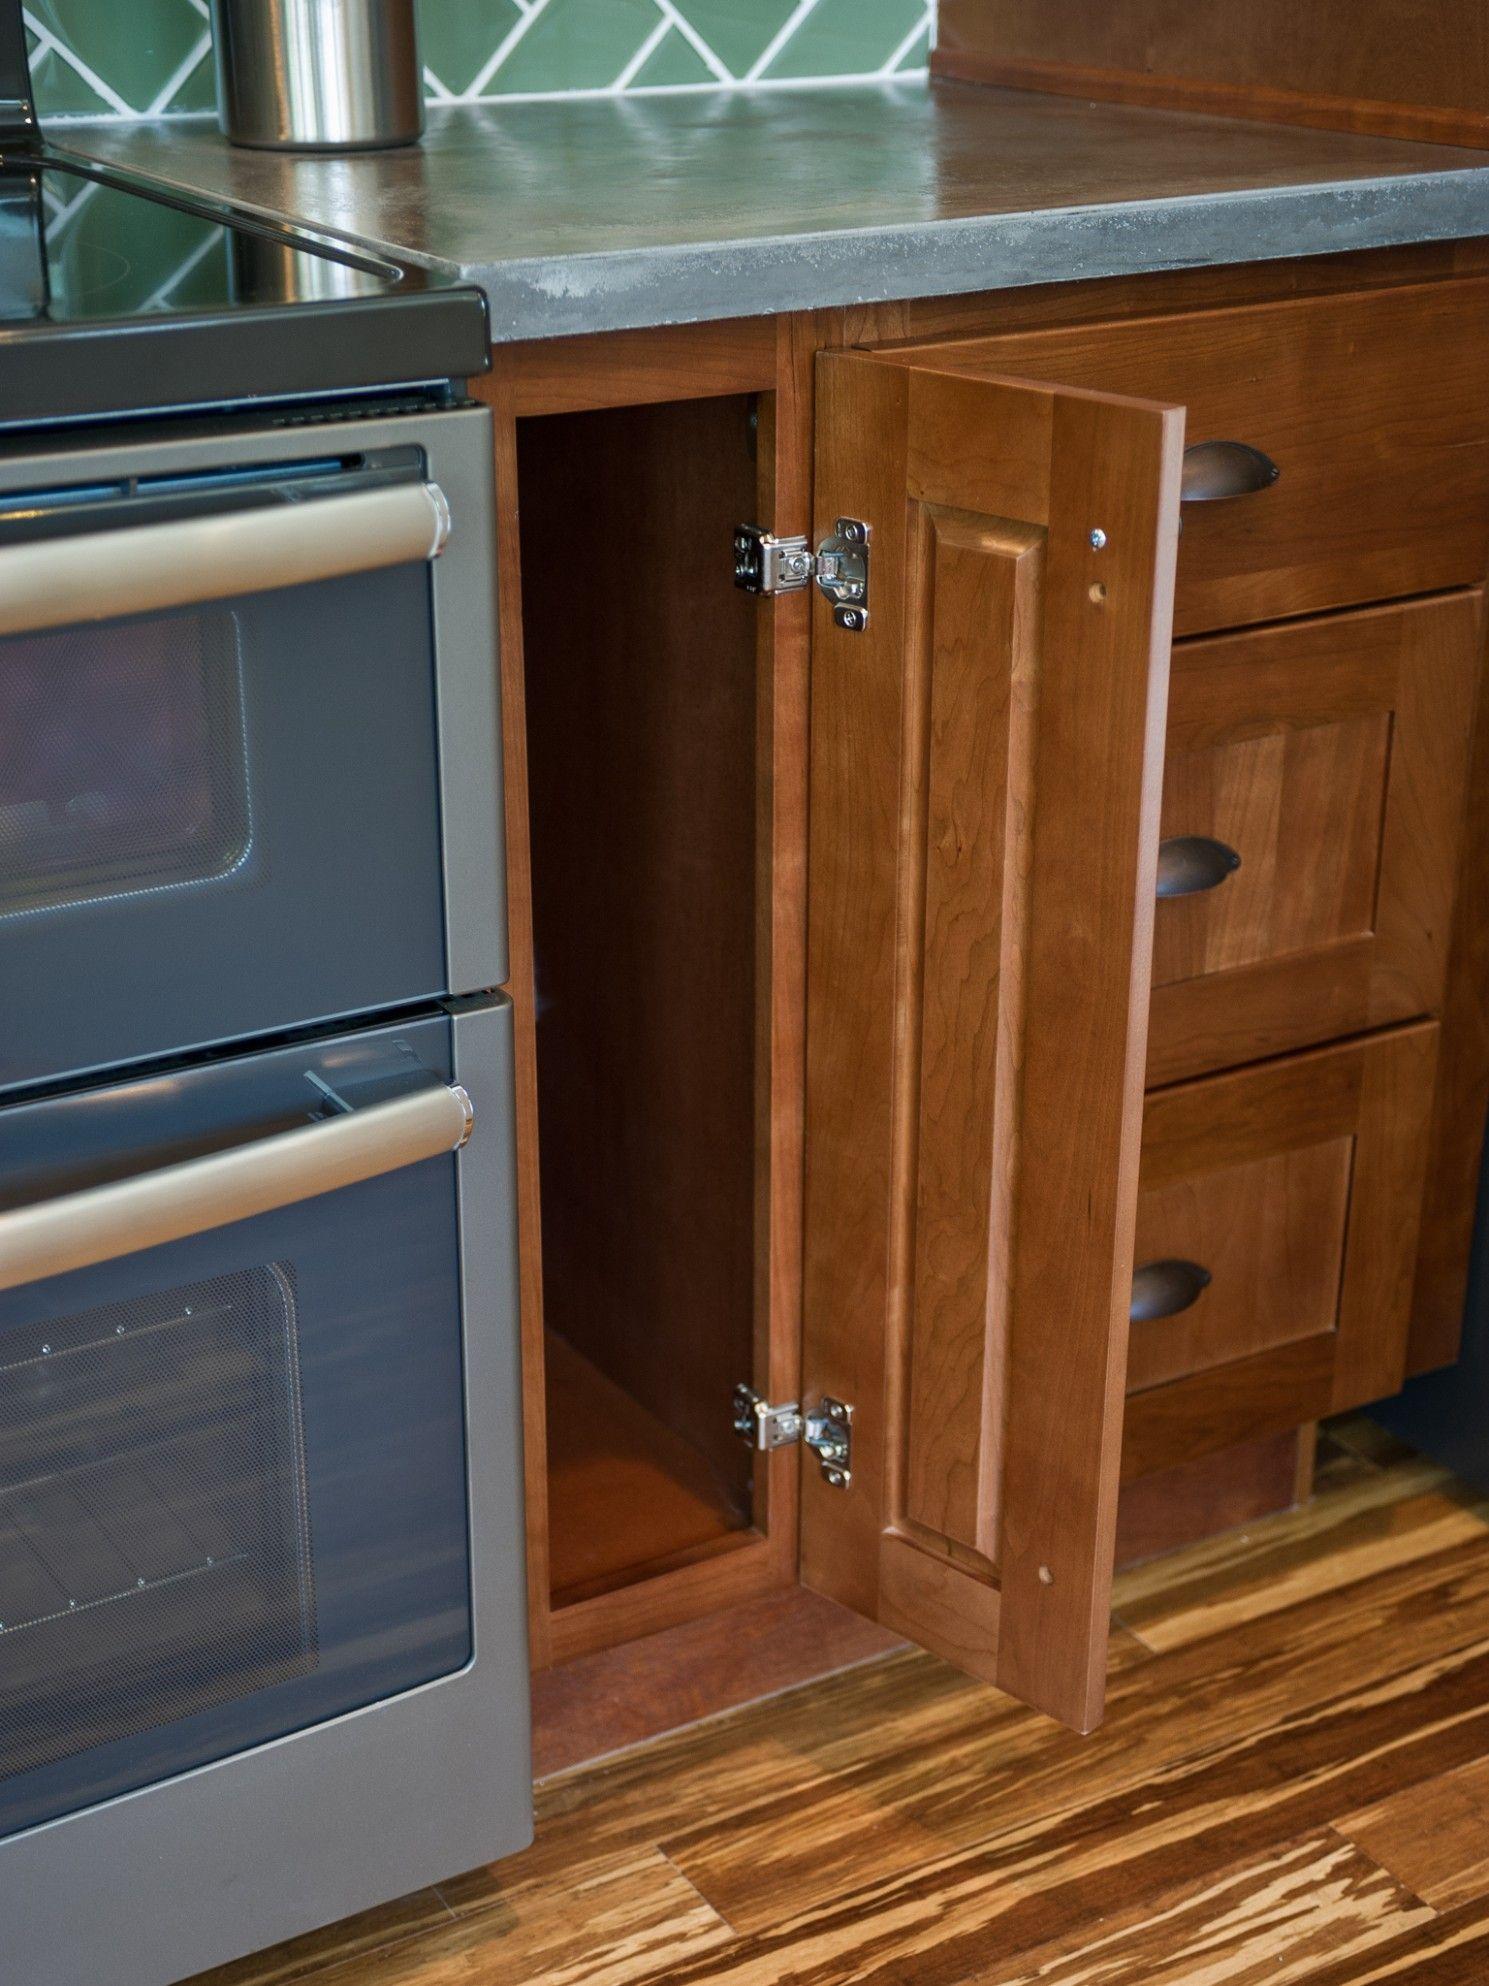 6 tips to create kitchen liquidators near me